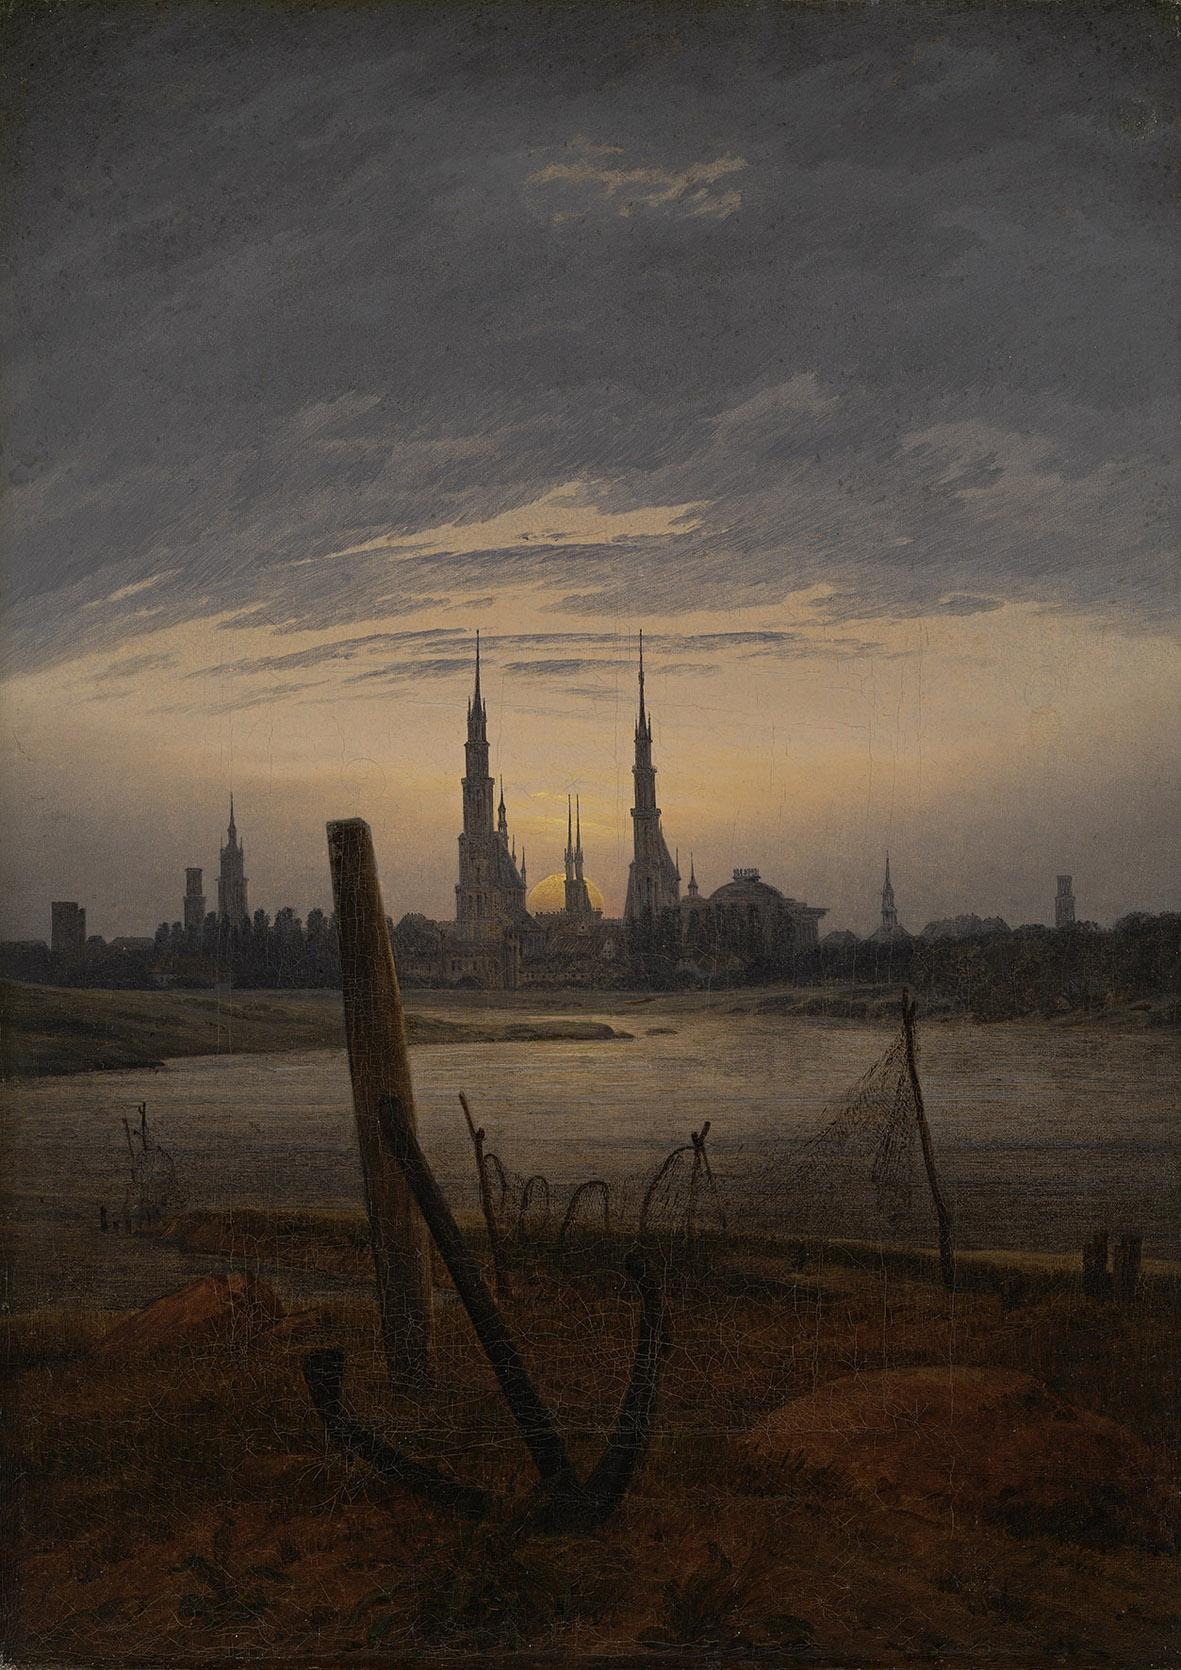 Caspar David Friedrich, Città al chiaro di luna, 1817 olio su tela, cm 45,8 x 33 Winterthur, Museum Oskar Reinhart am Stadtgarten